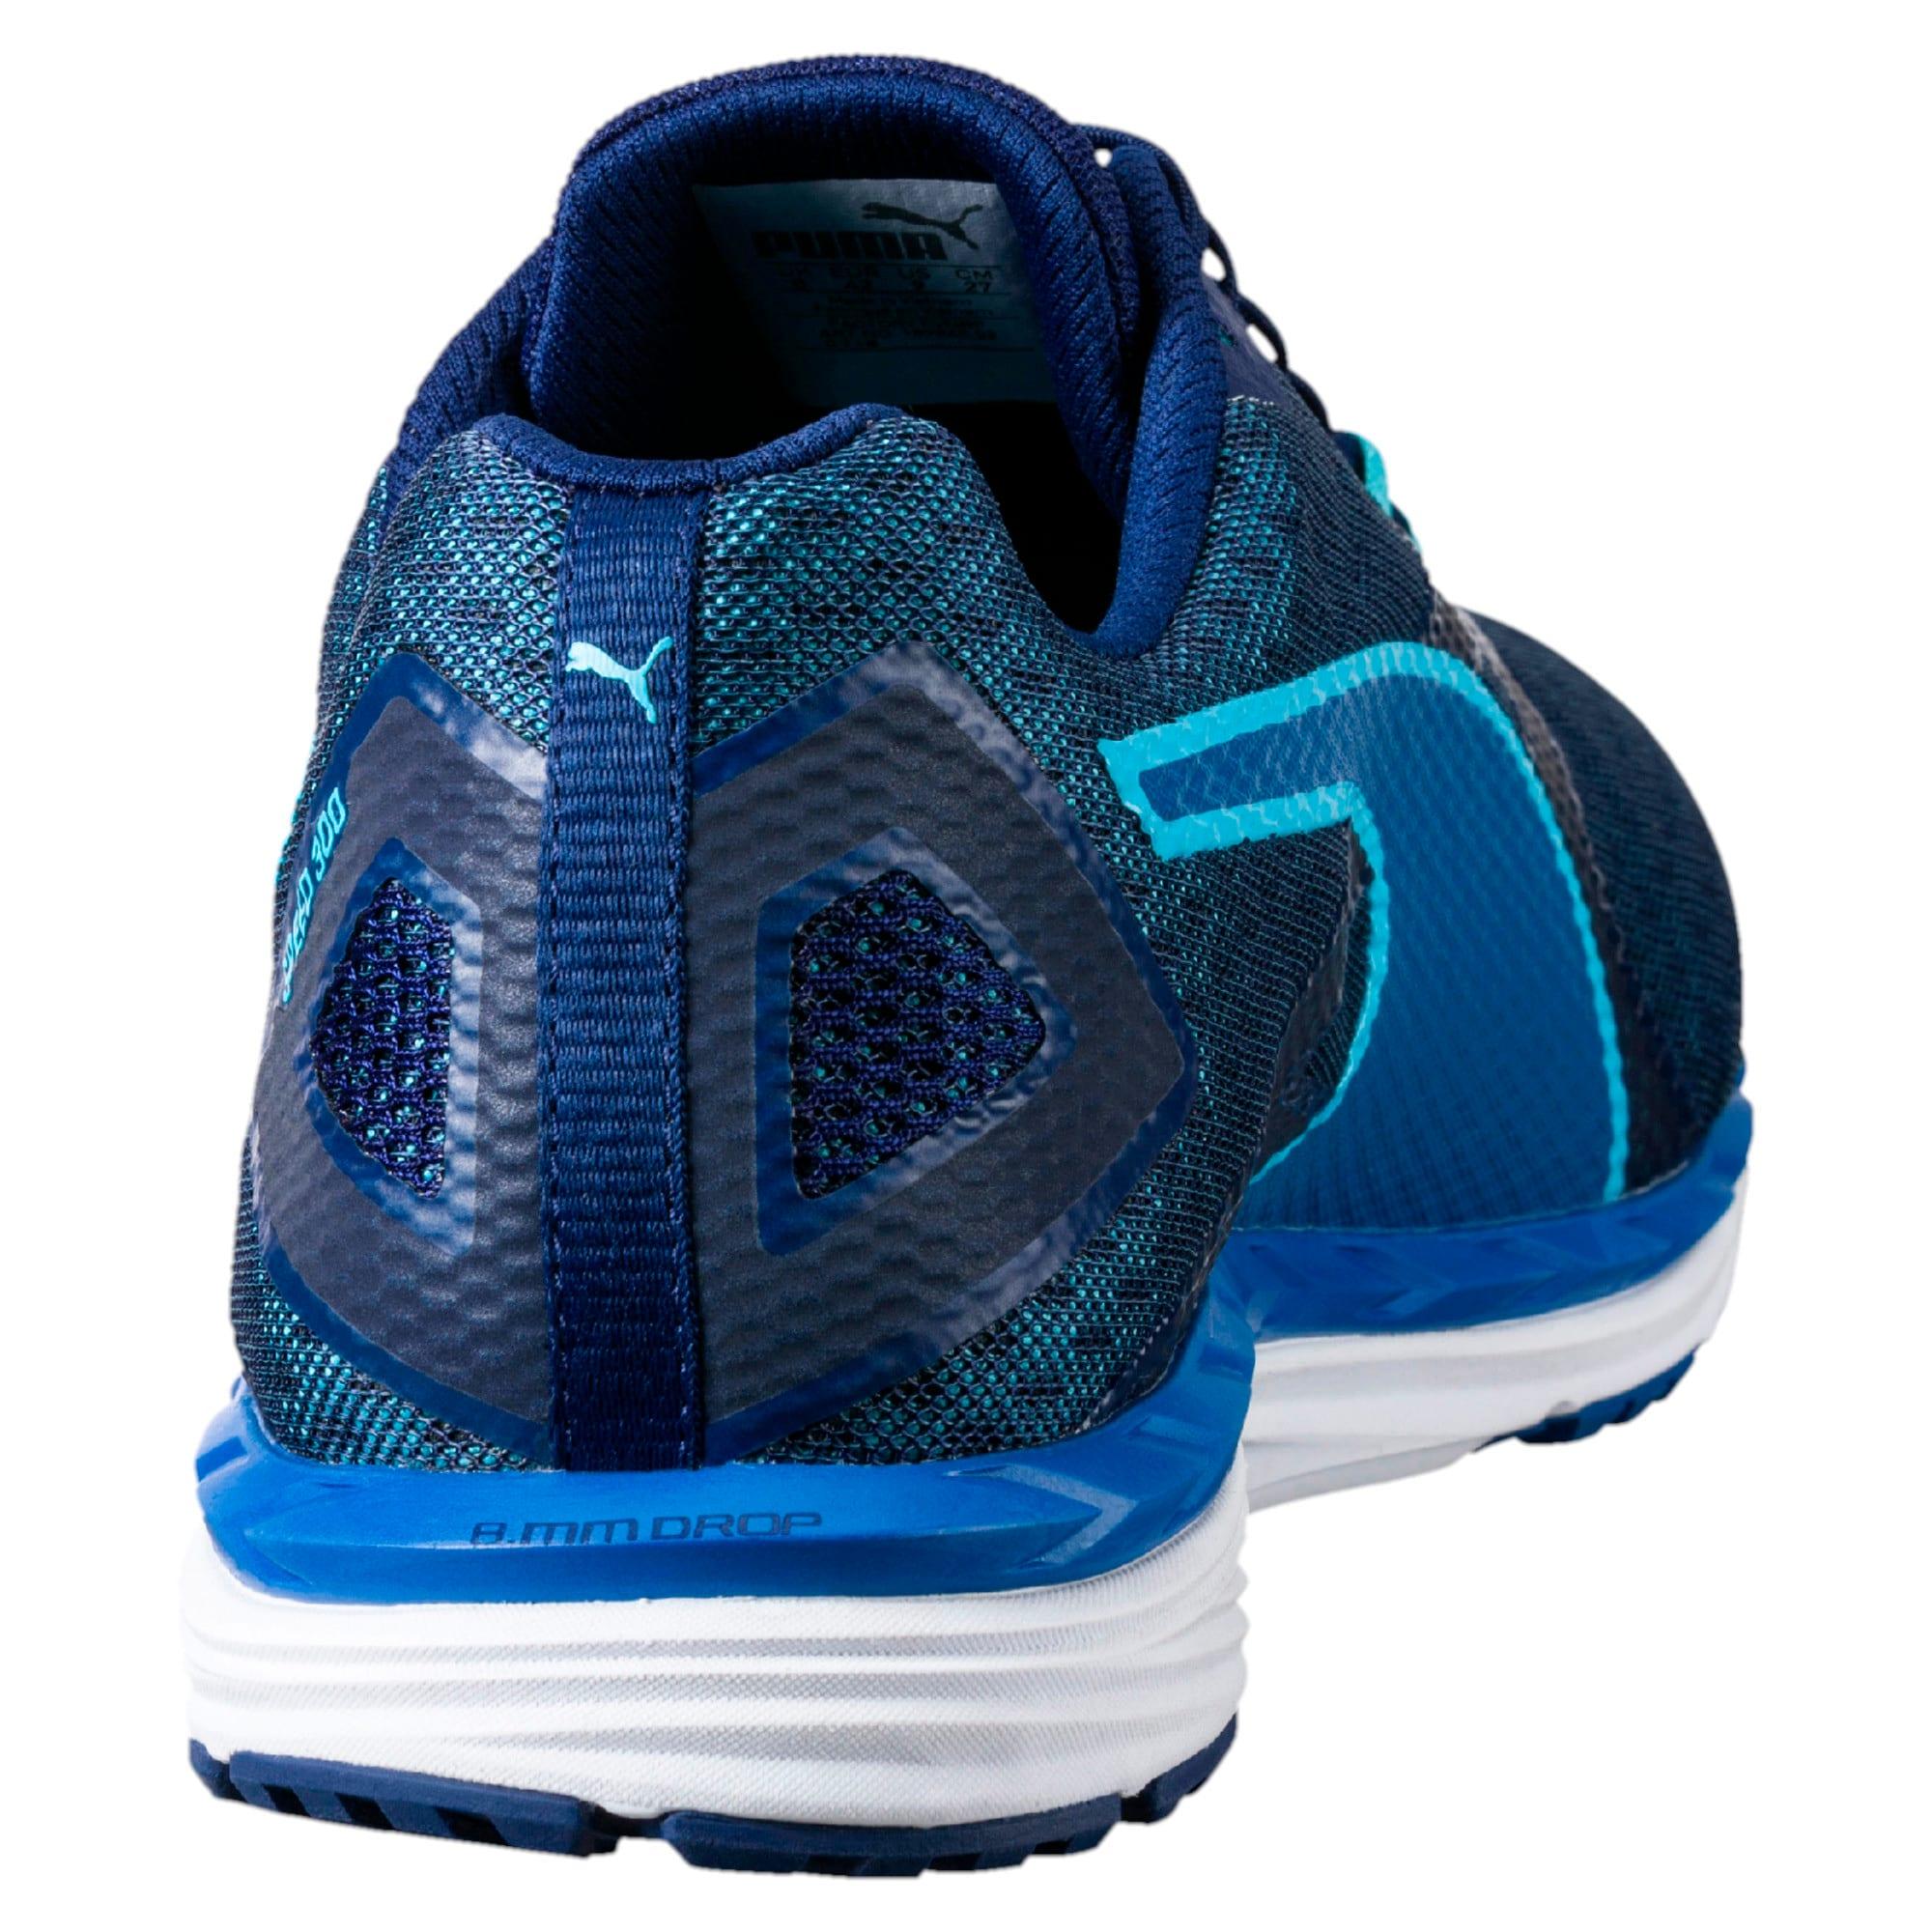 Thumbnail 3 of Speed 300 IGNITE 2 Men's Running Shoes, LapisBlue-BlueDepths-Turq, medium-IND